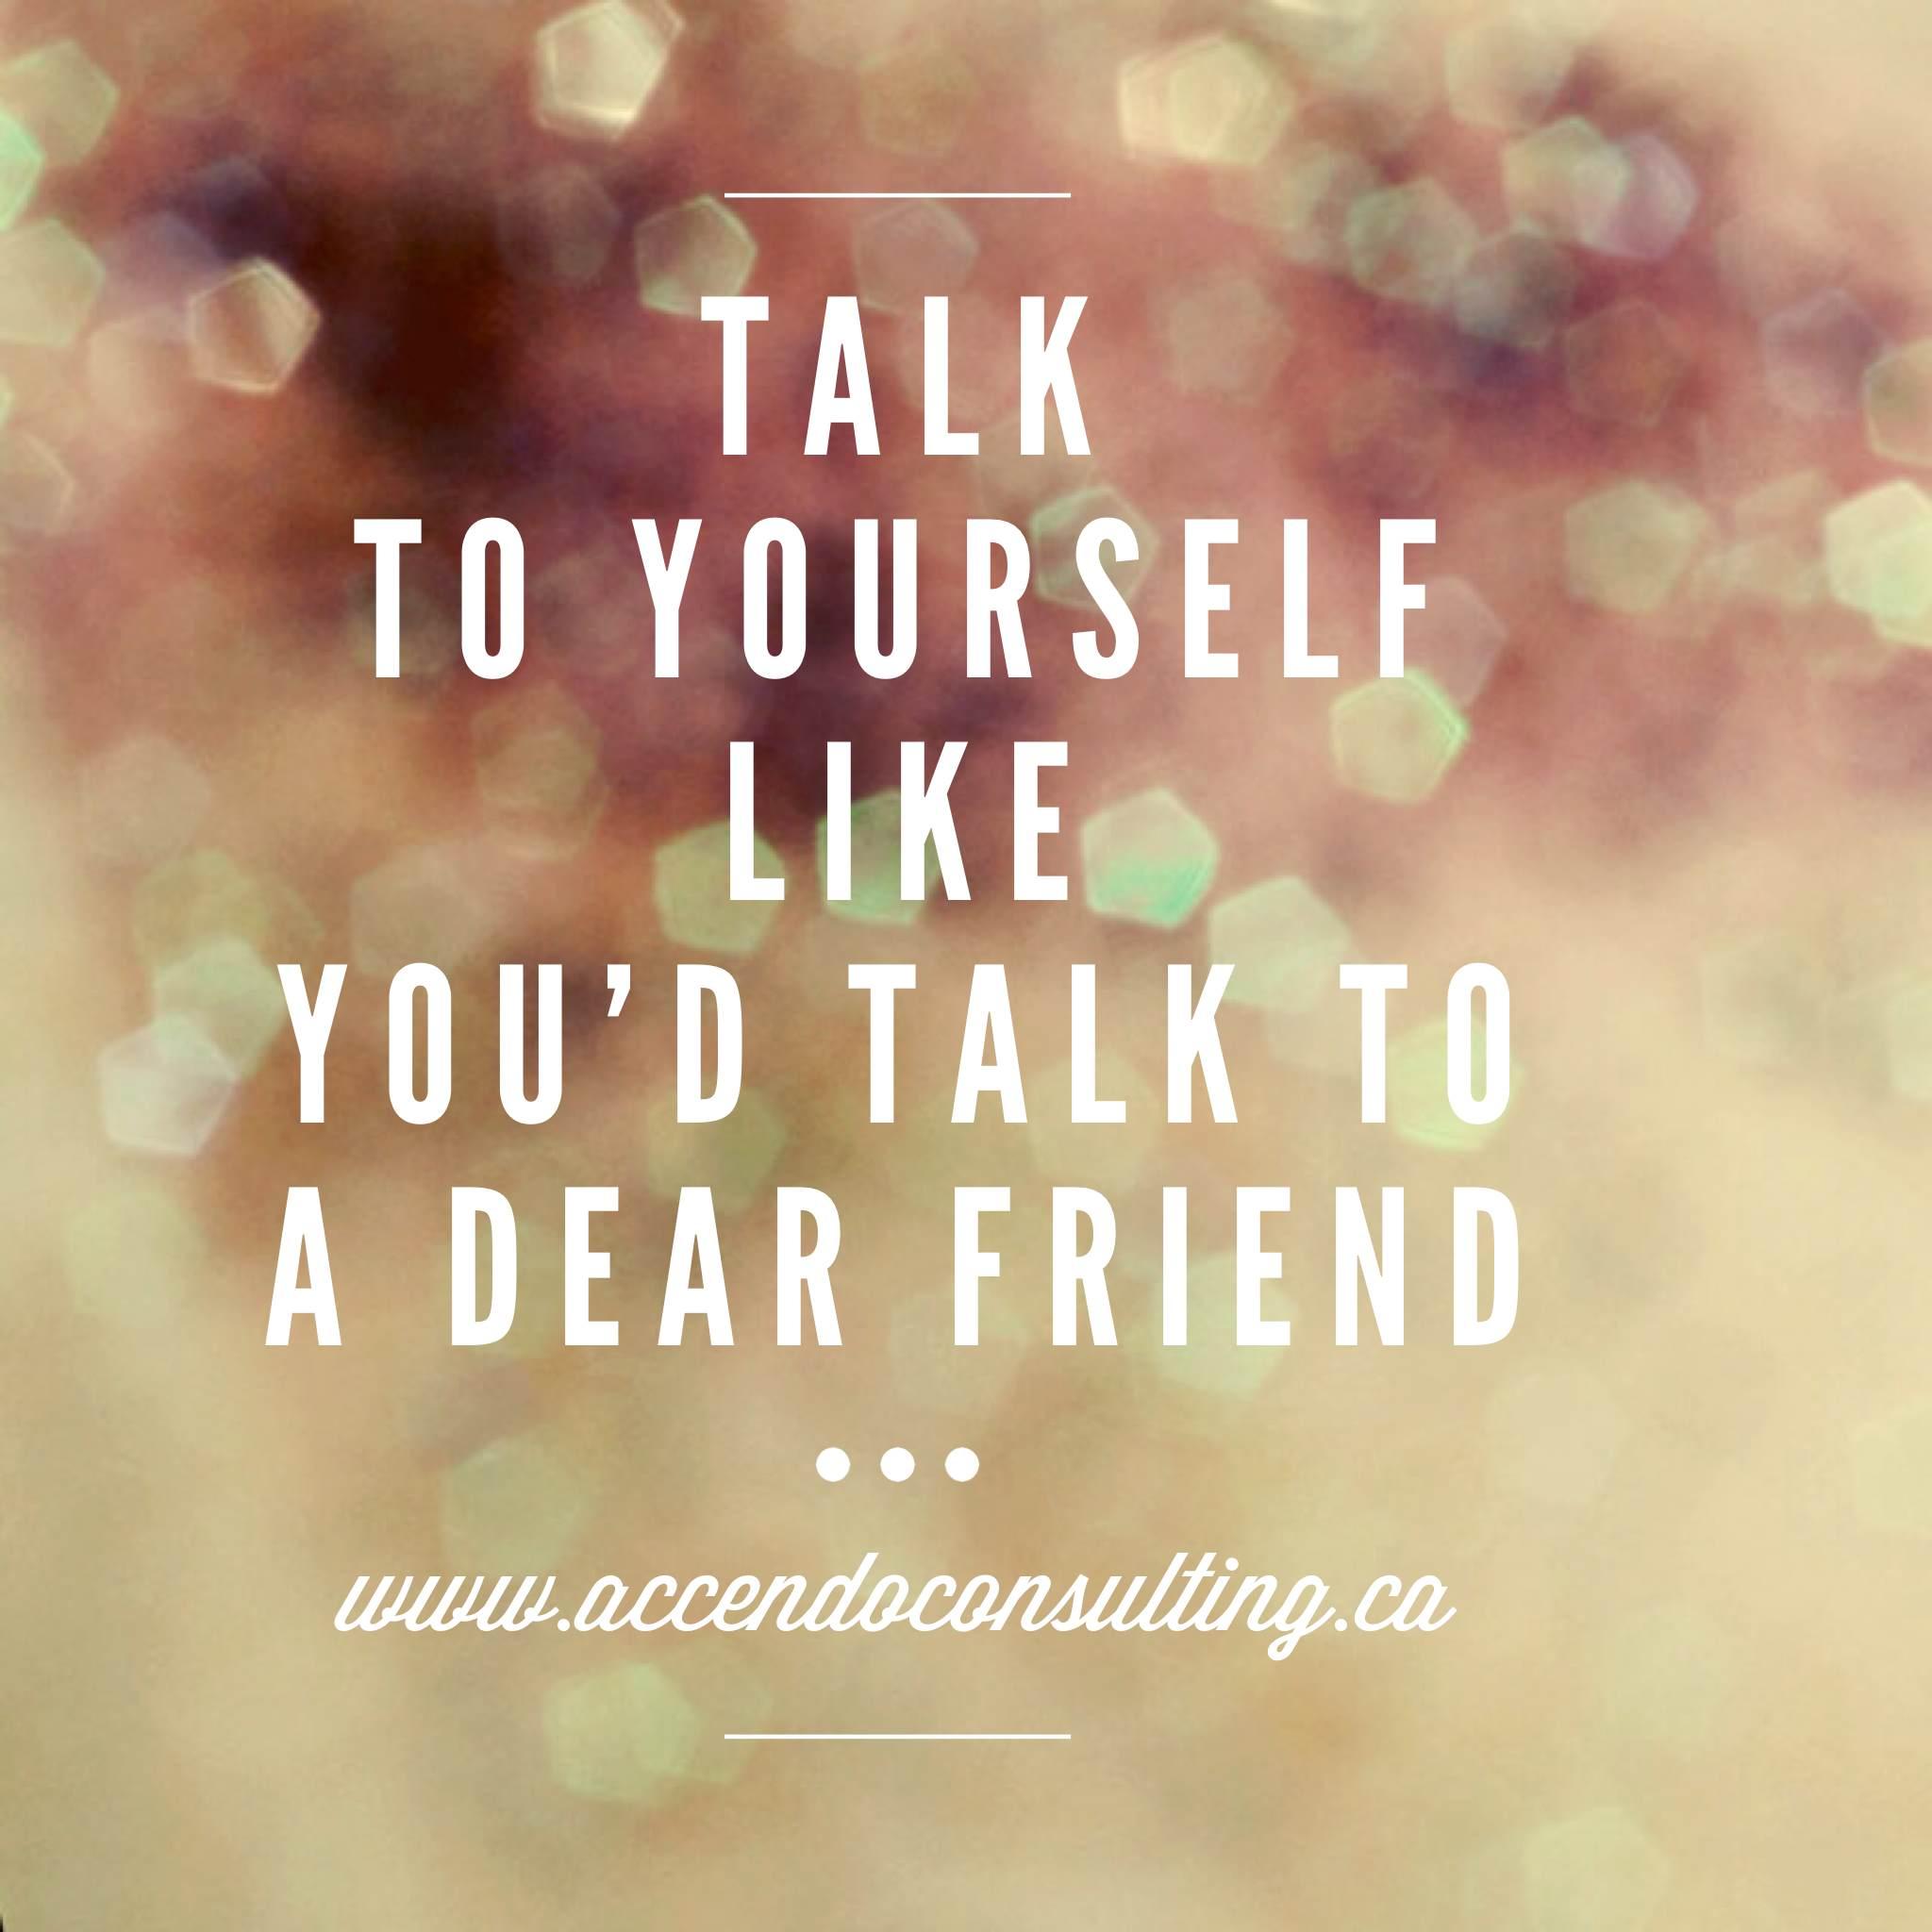 Talk to yourself like you'd talk to a dear friend